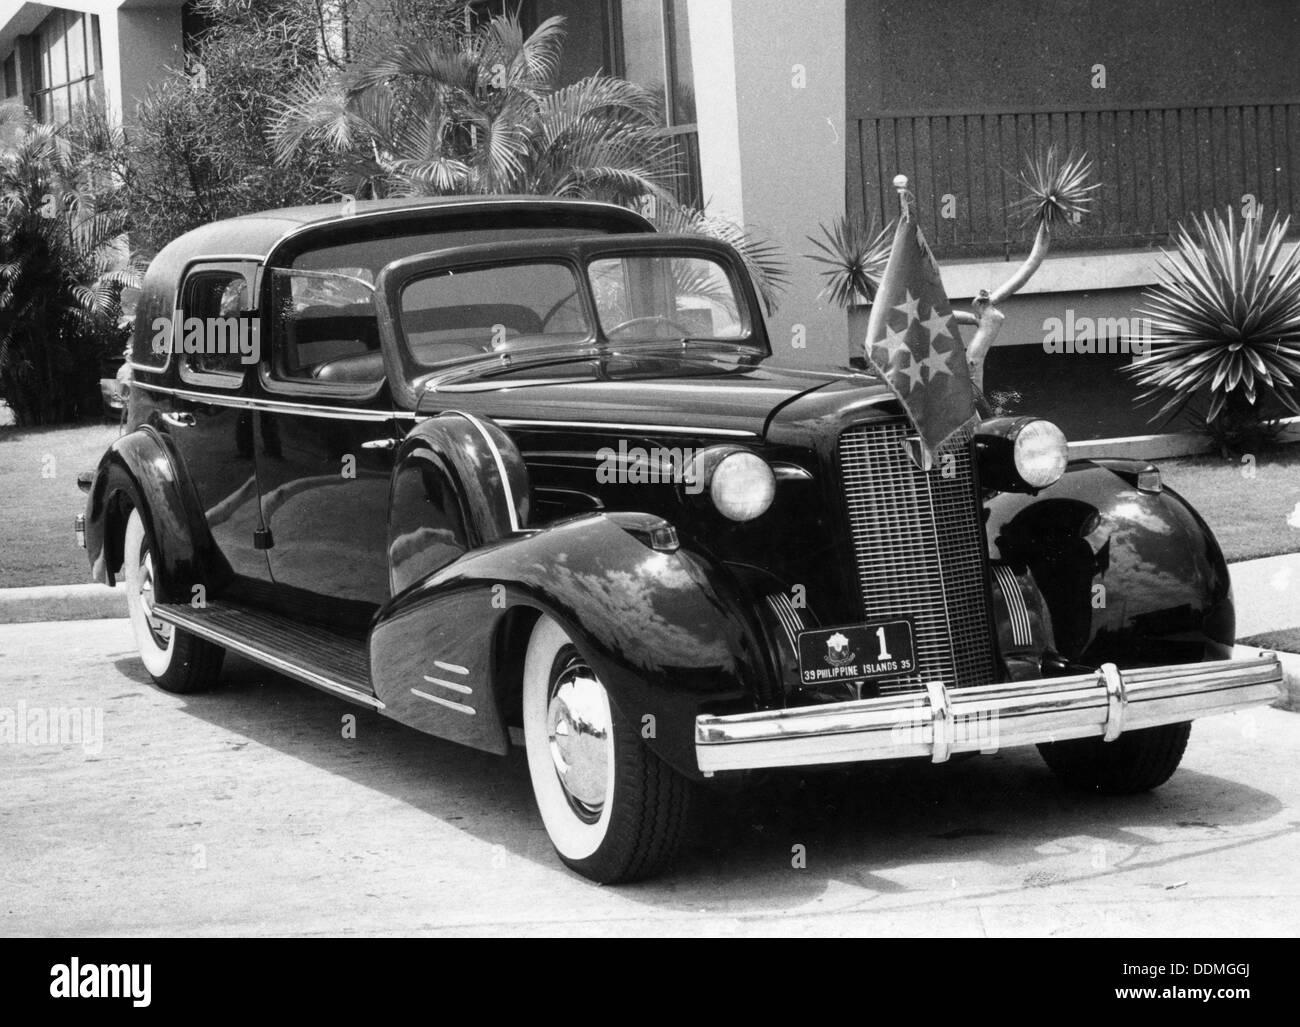 Cadillac Motor Car Stockfotos & Cadillac Motor Car Bilder - Alamy